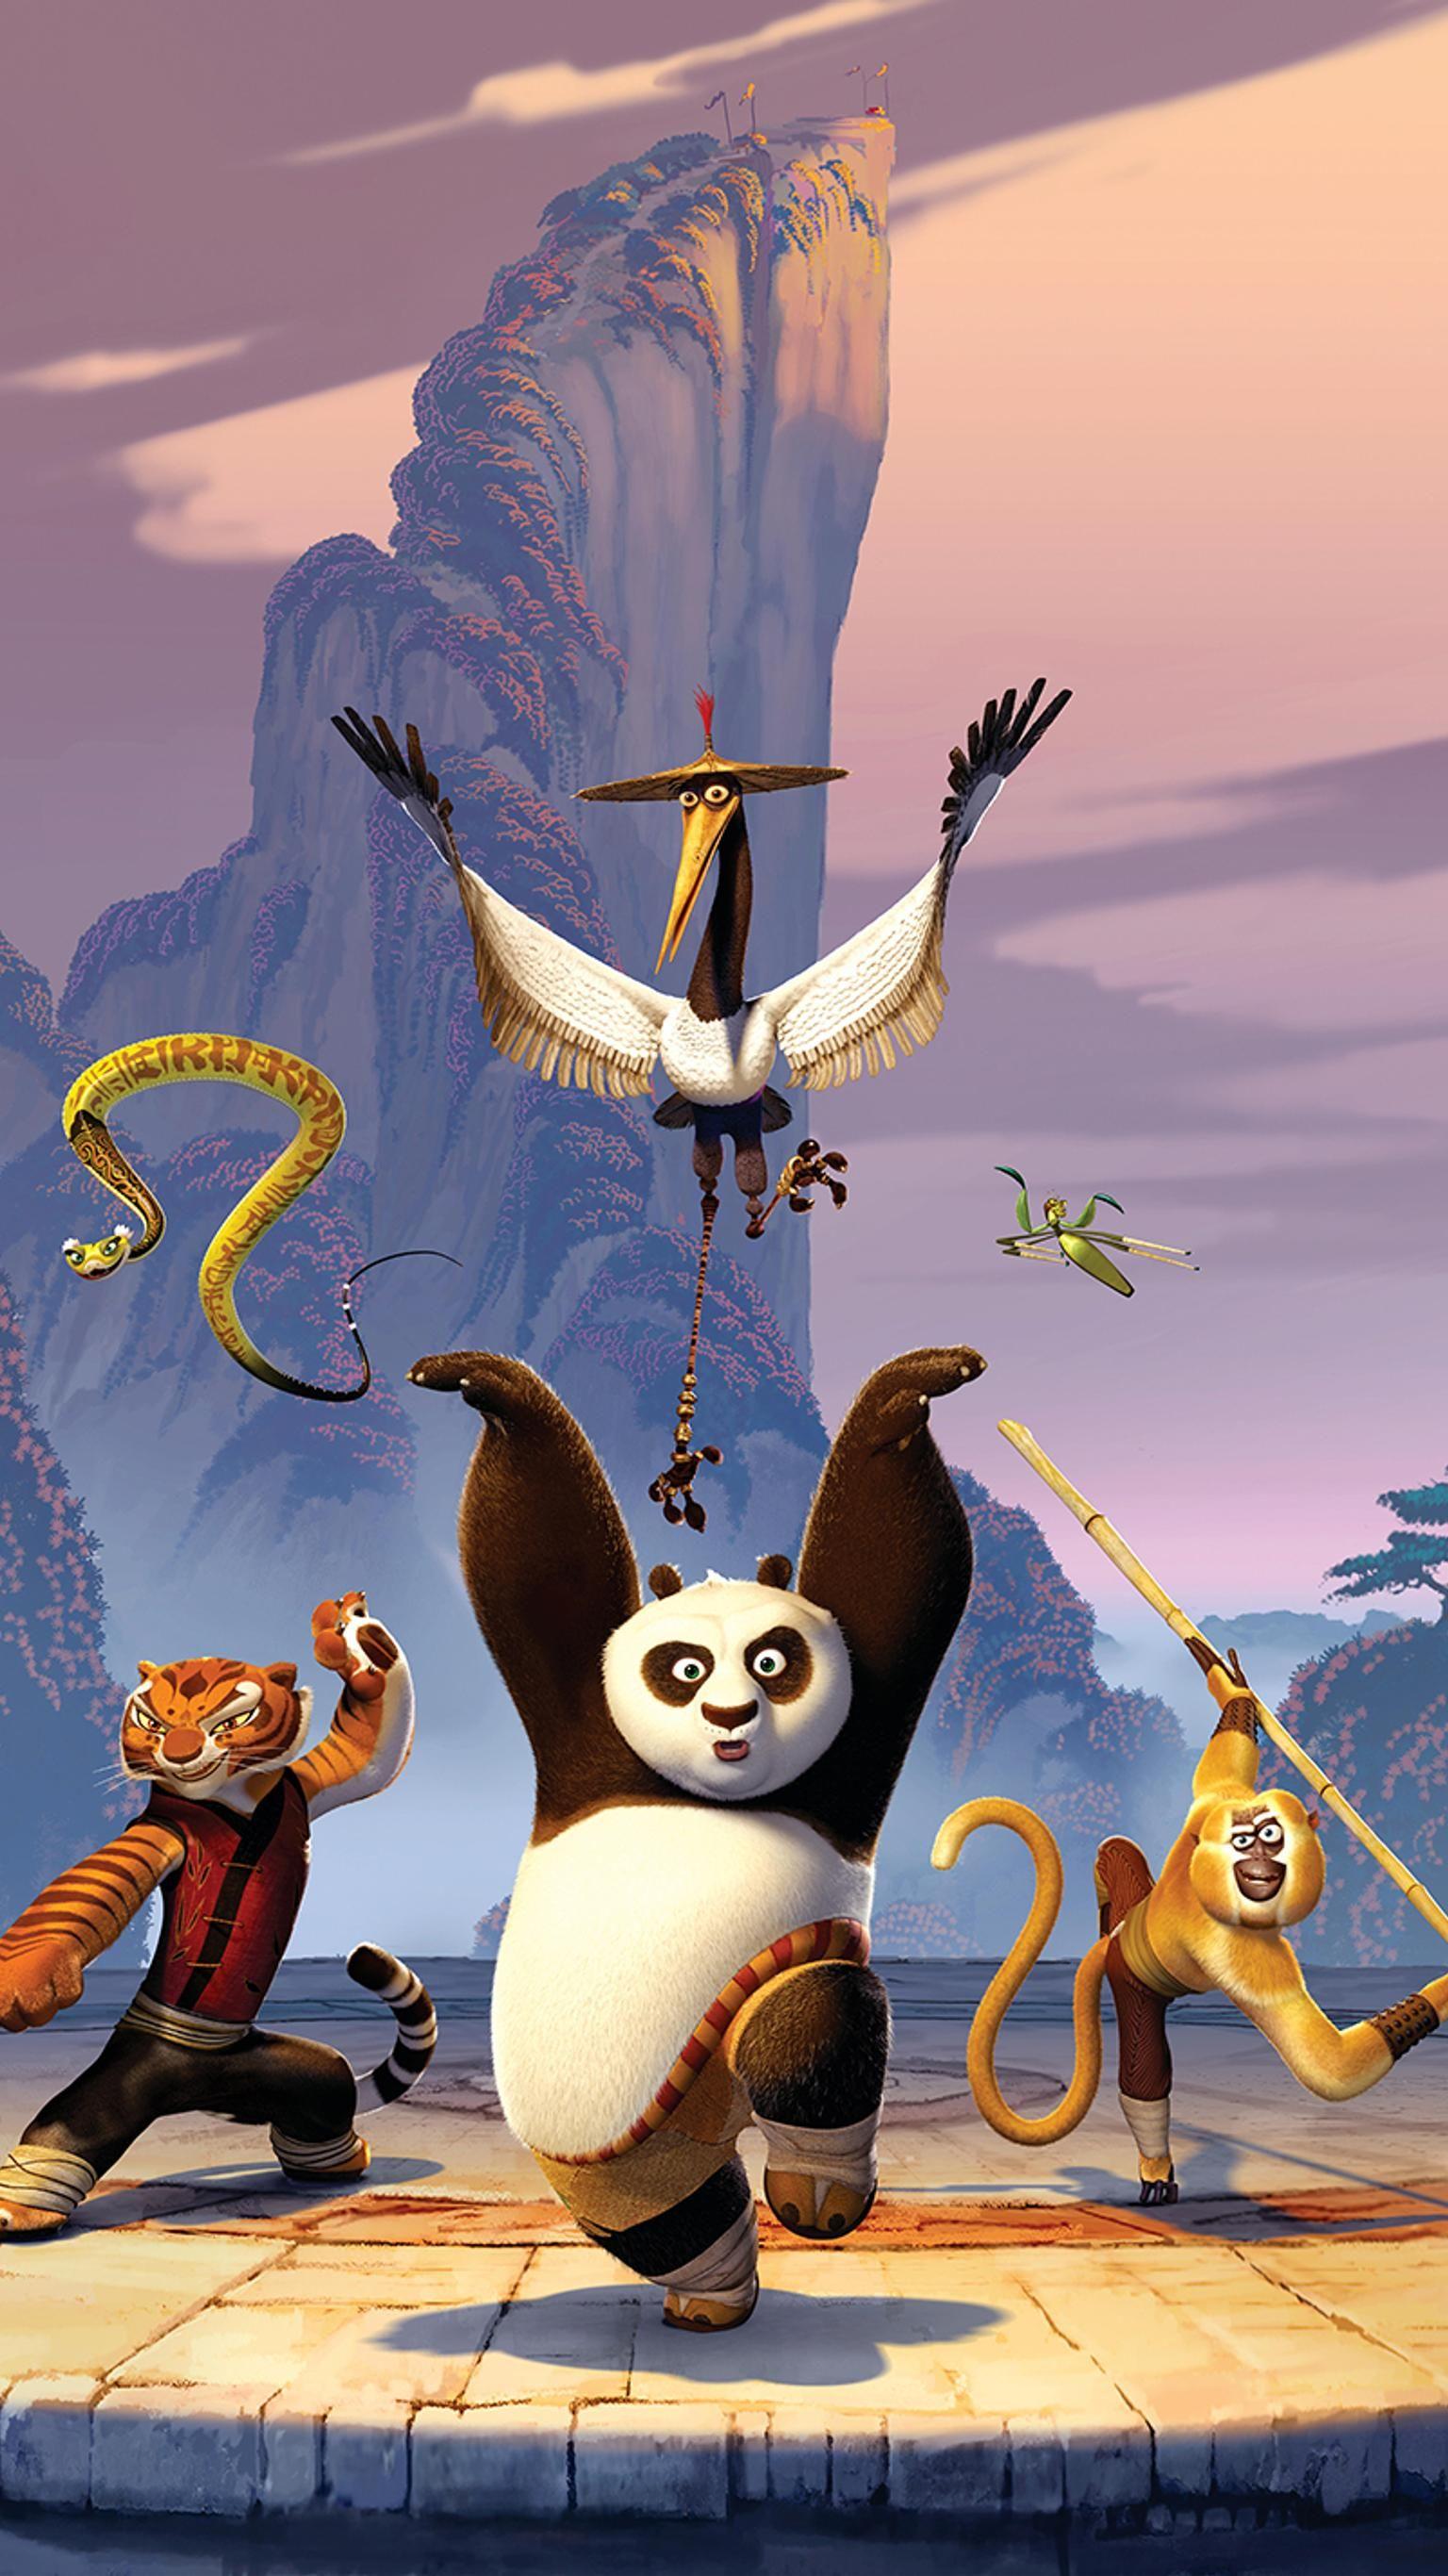 Kung Fu Panda 2008 Phone Wallpaper Moviemania Kung Fu Panda Animacoes Legais Filmes Desenhos Animados